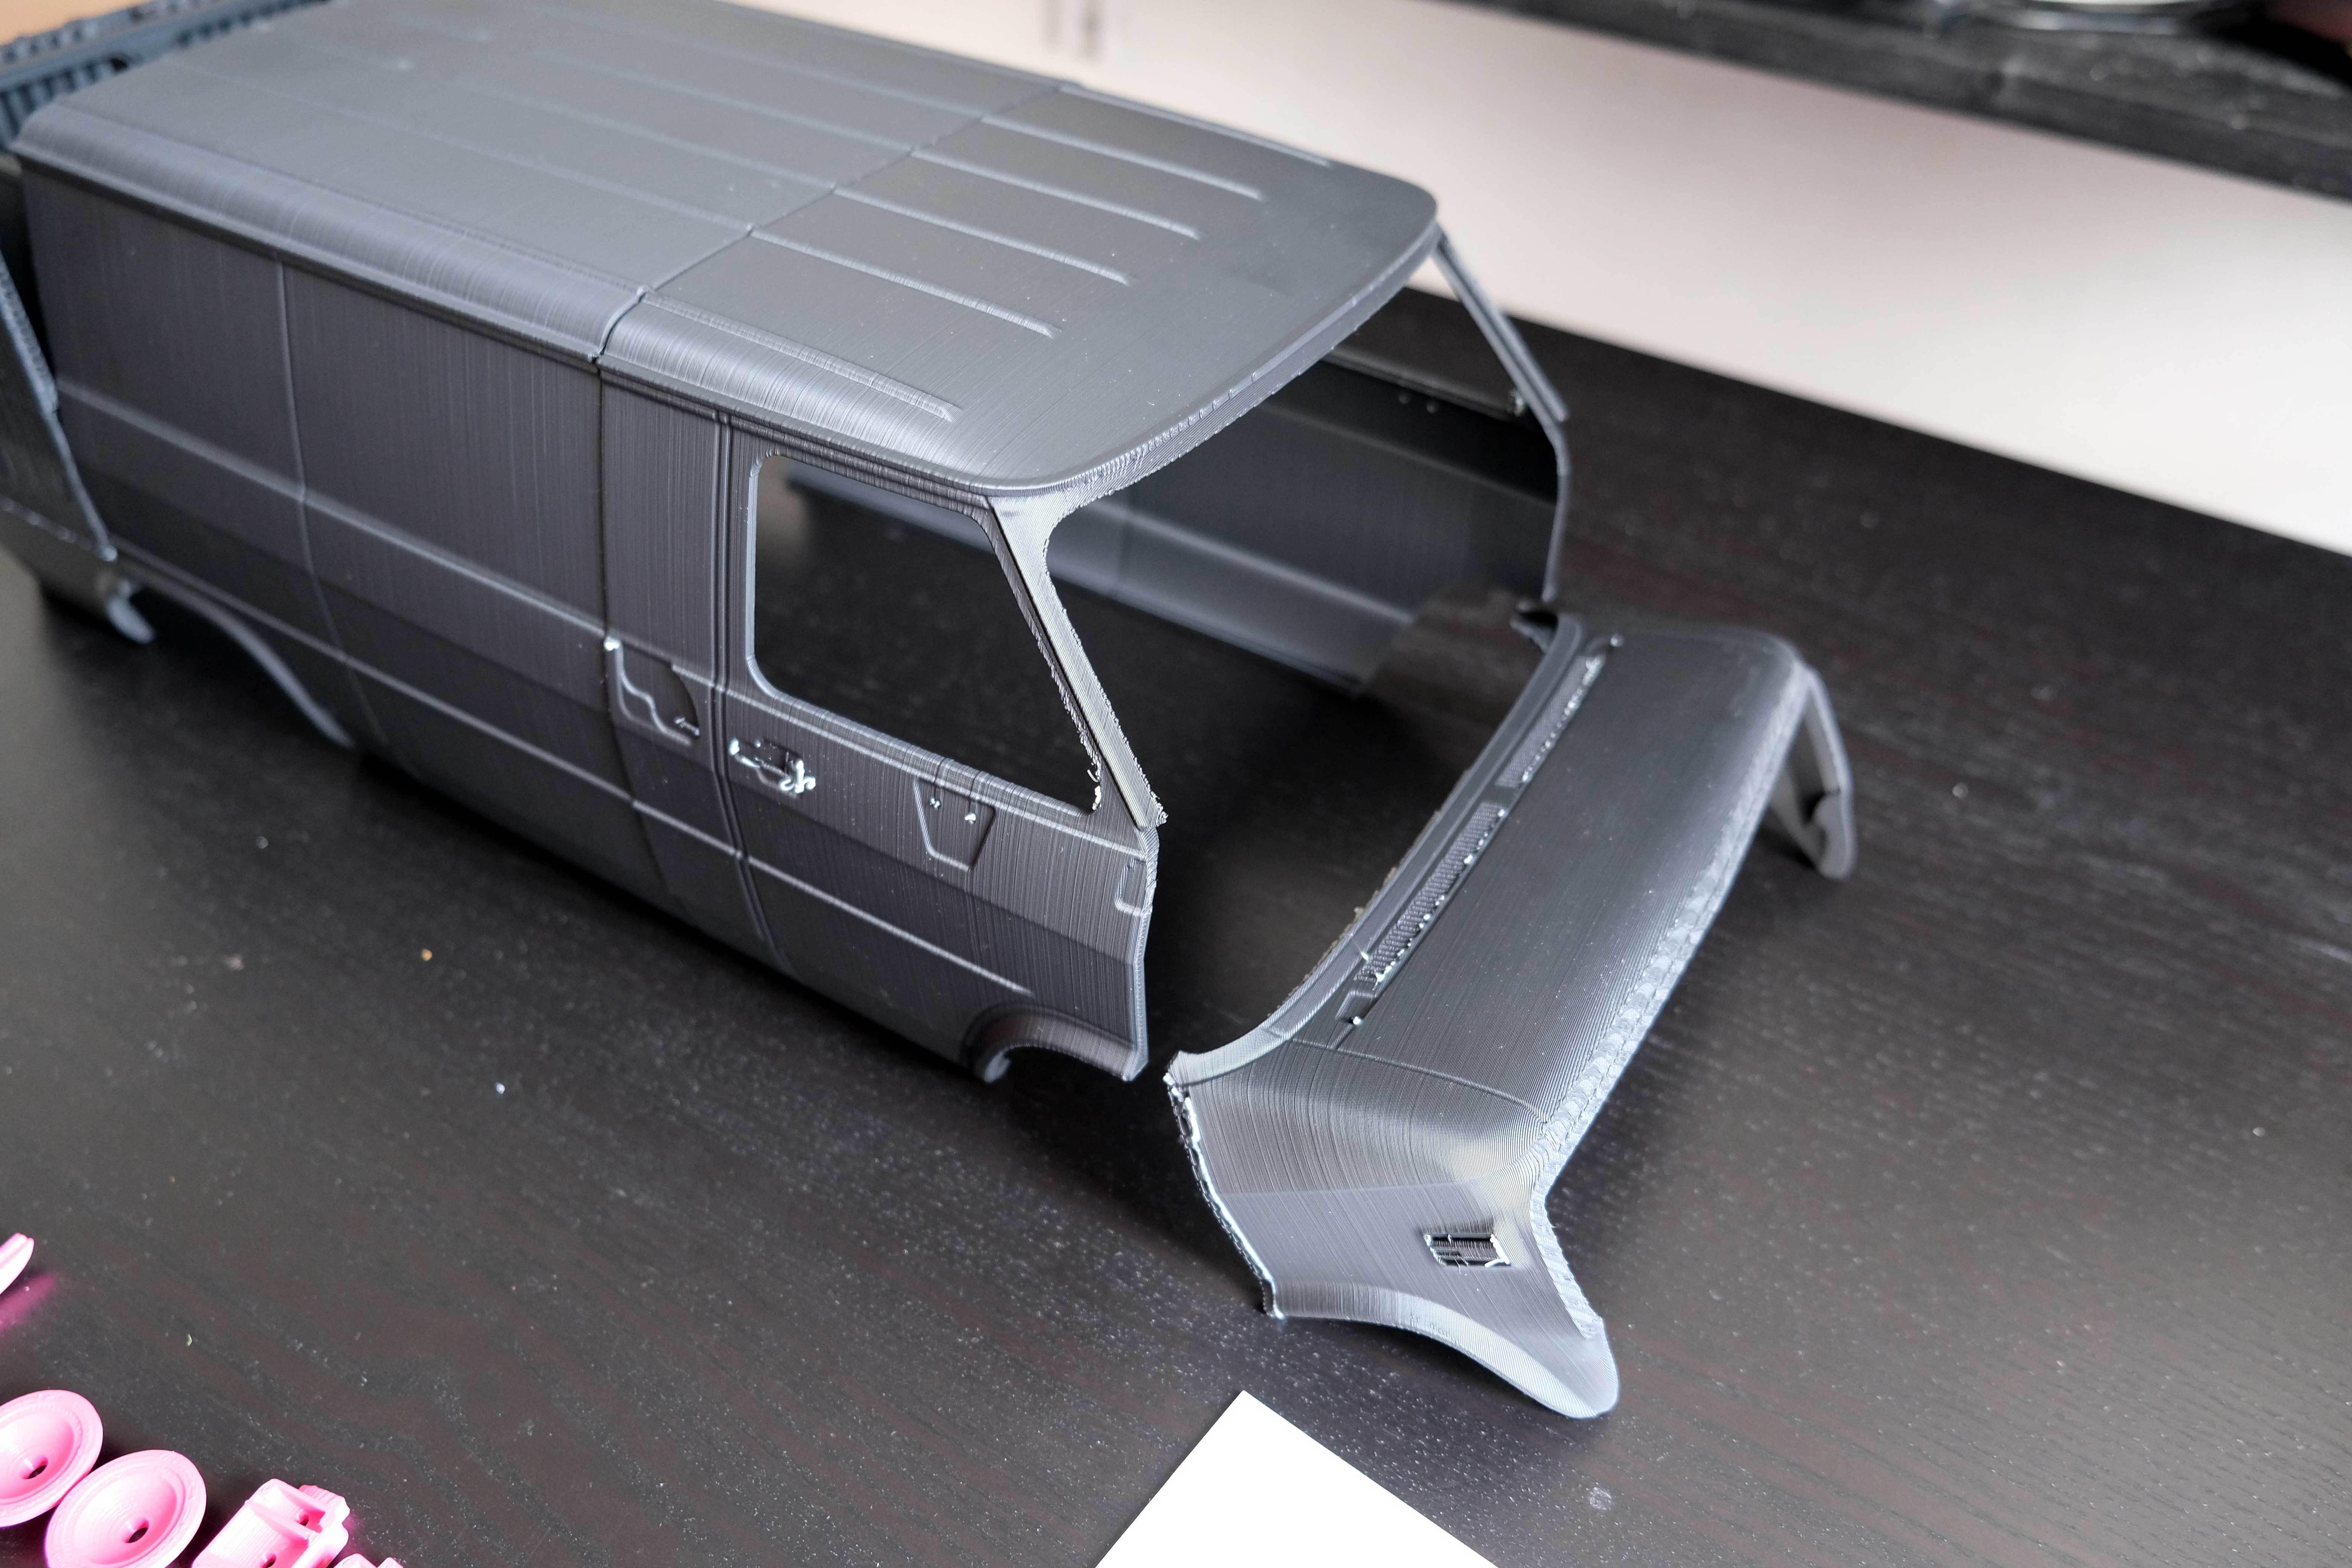 chevy-van-g20-3d-printed-11.jpg Descargar archivo STL CHEVY VAN G20 RC BODY SCALER AXIAL MST TRX4 RC4WD • Modelo para imprimir en 3D, ilyakapitonov